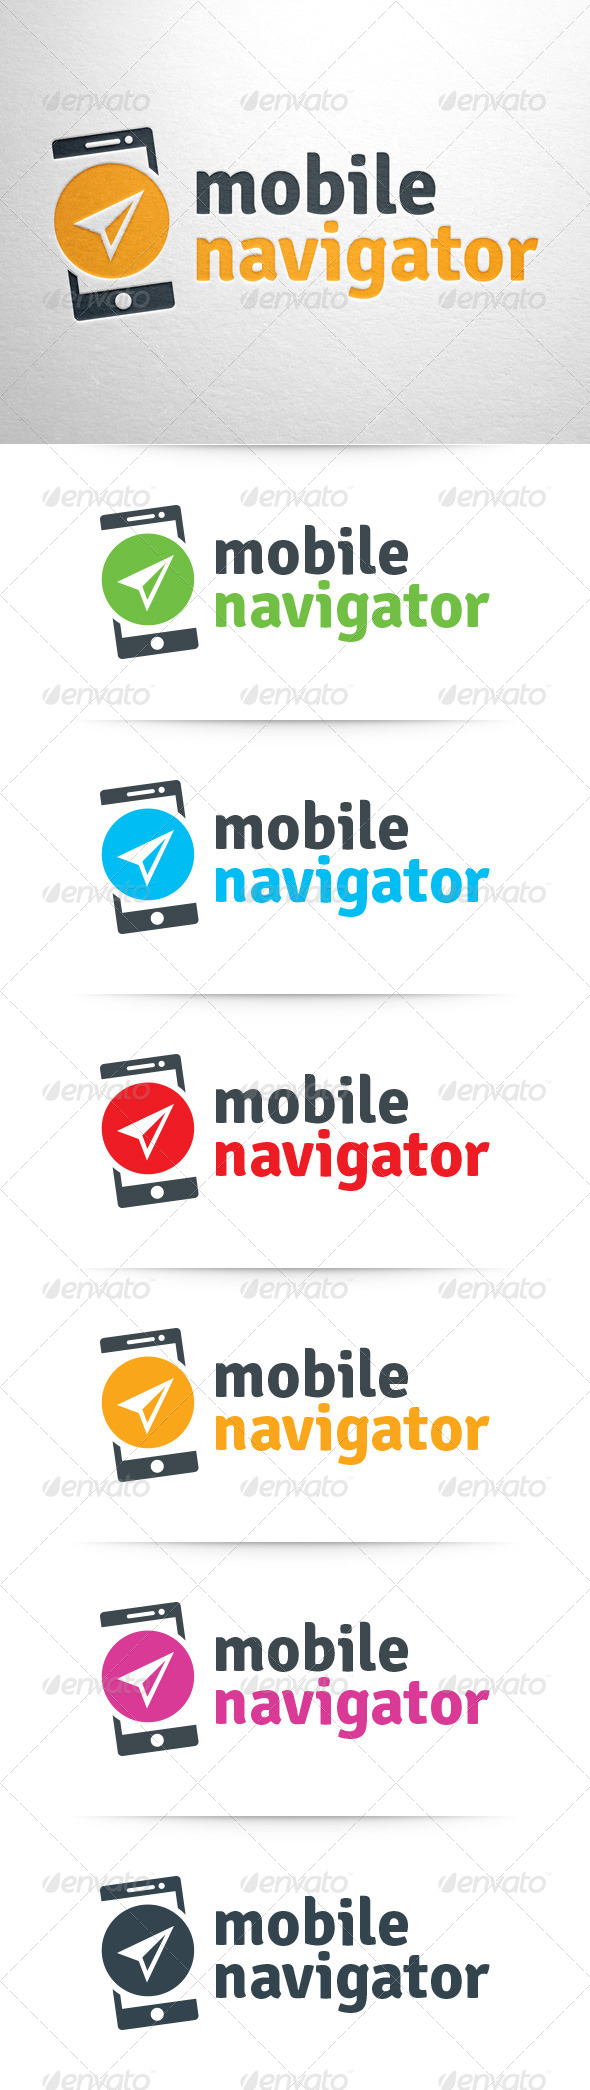 GraphicRiver Mobile Navigator Logo Template 8015580